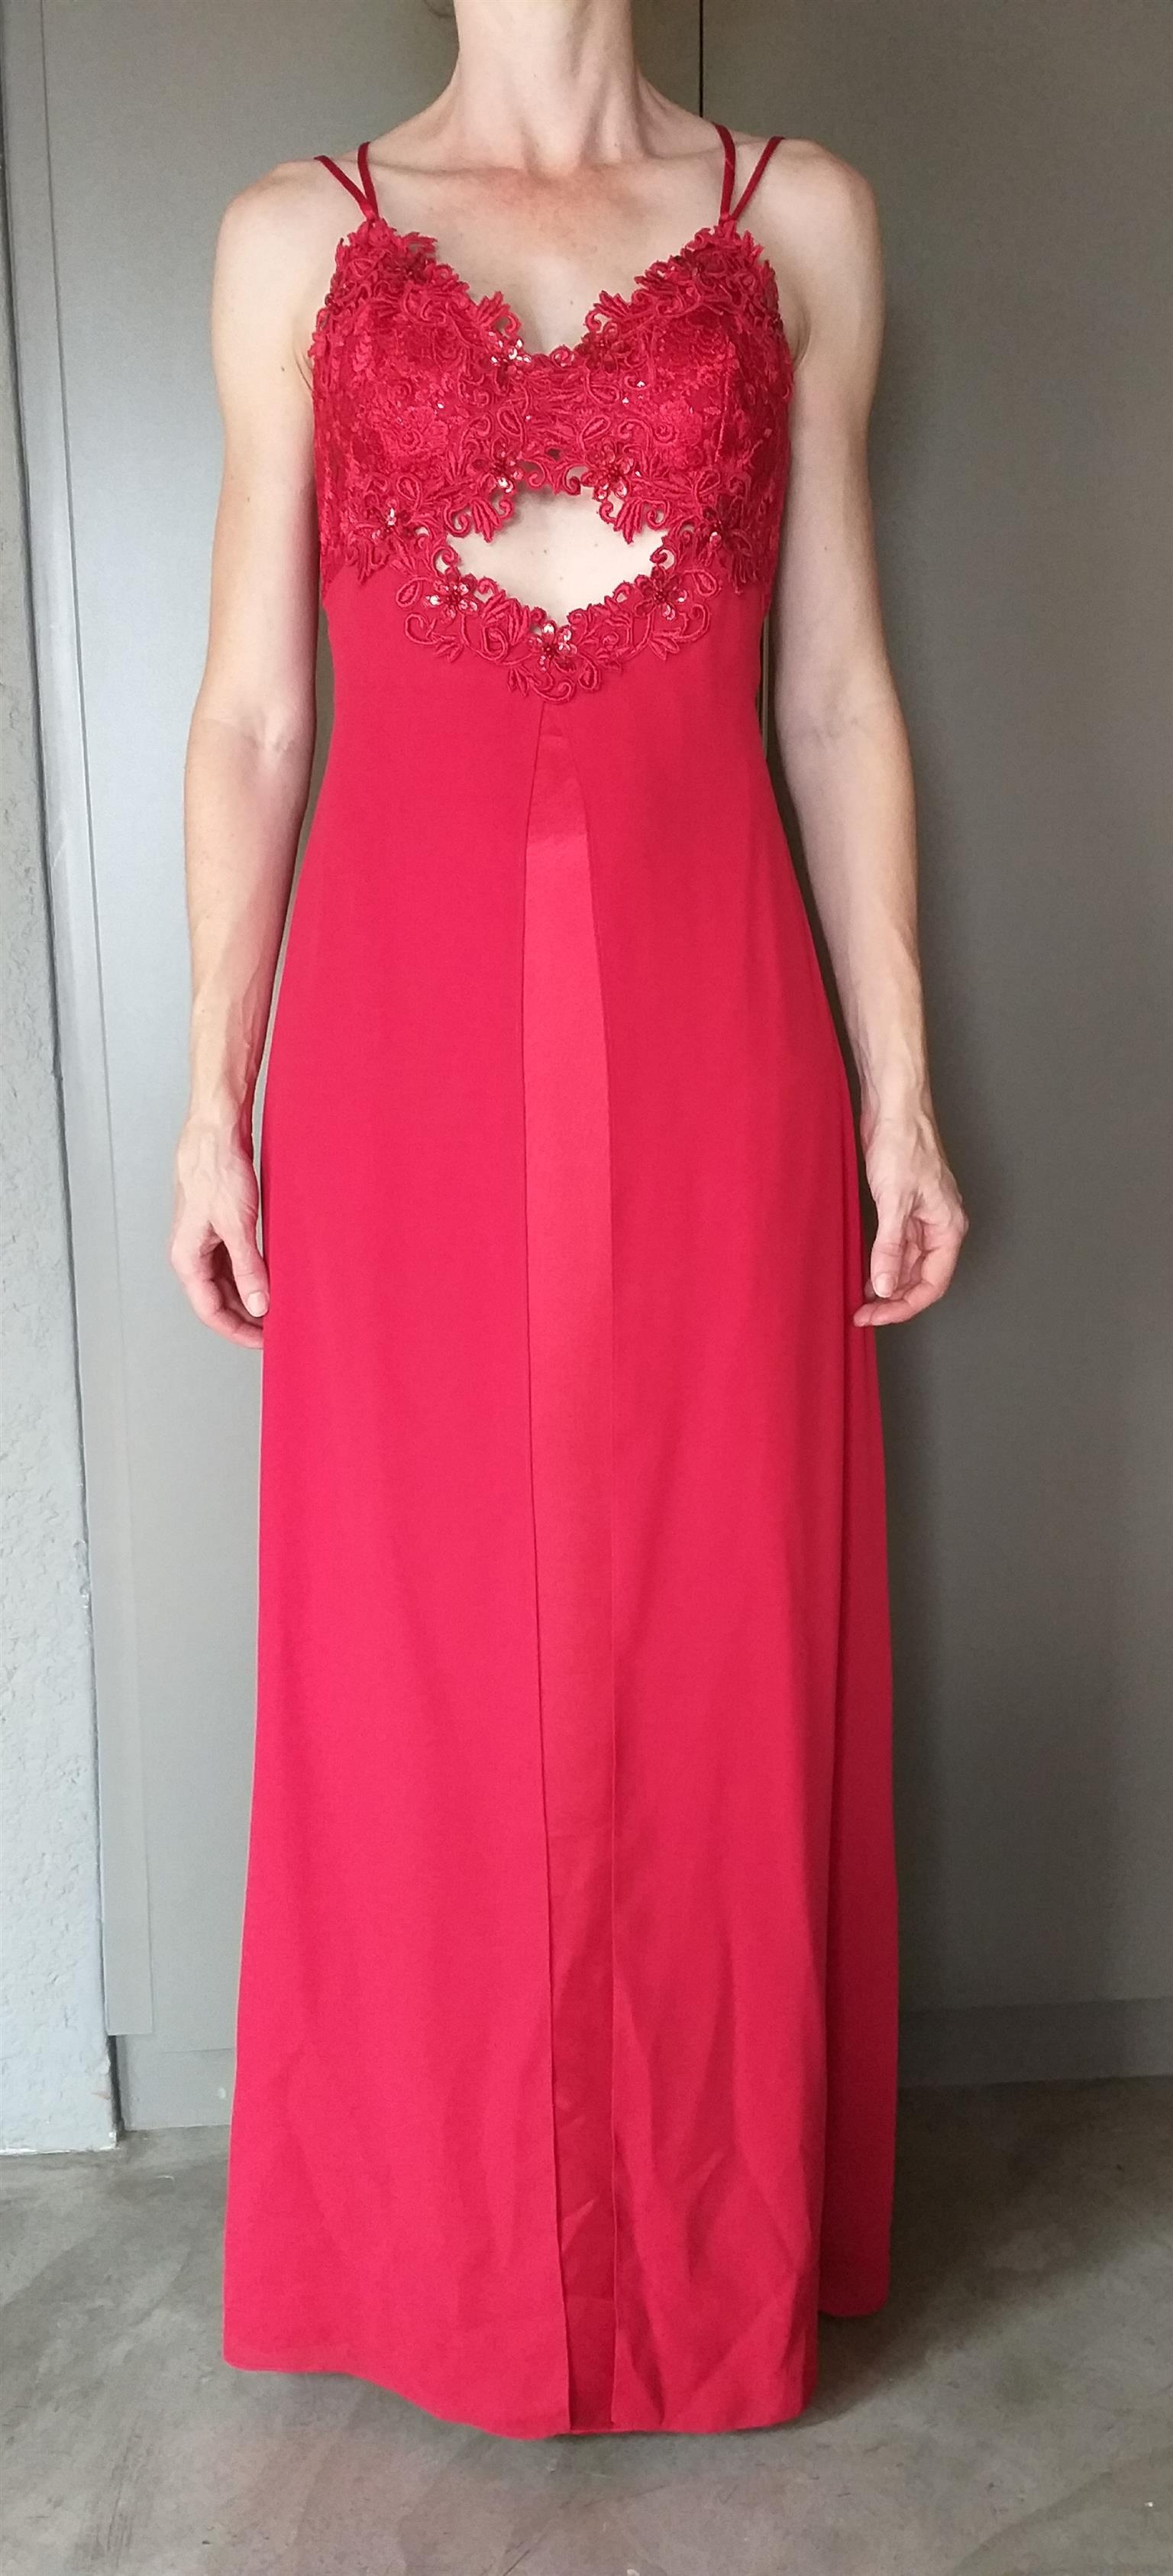 Pallu Red Evening Dress